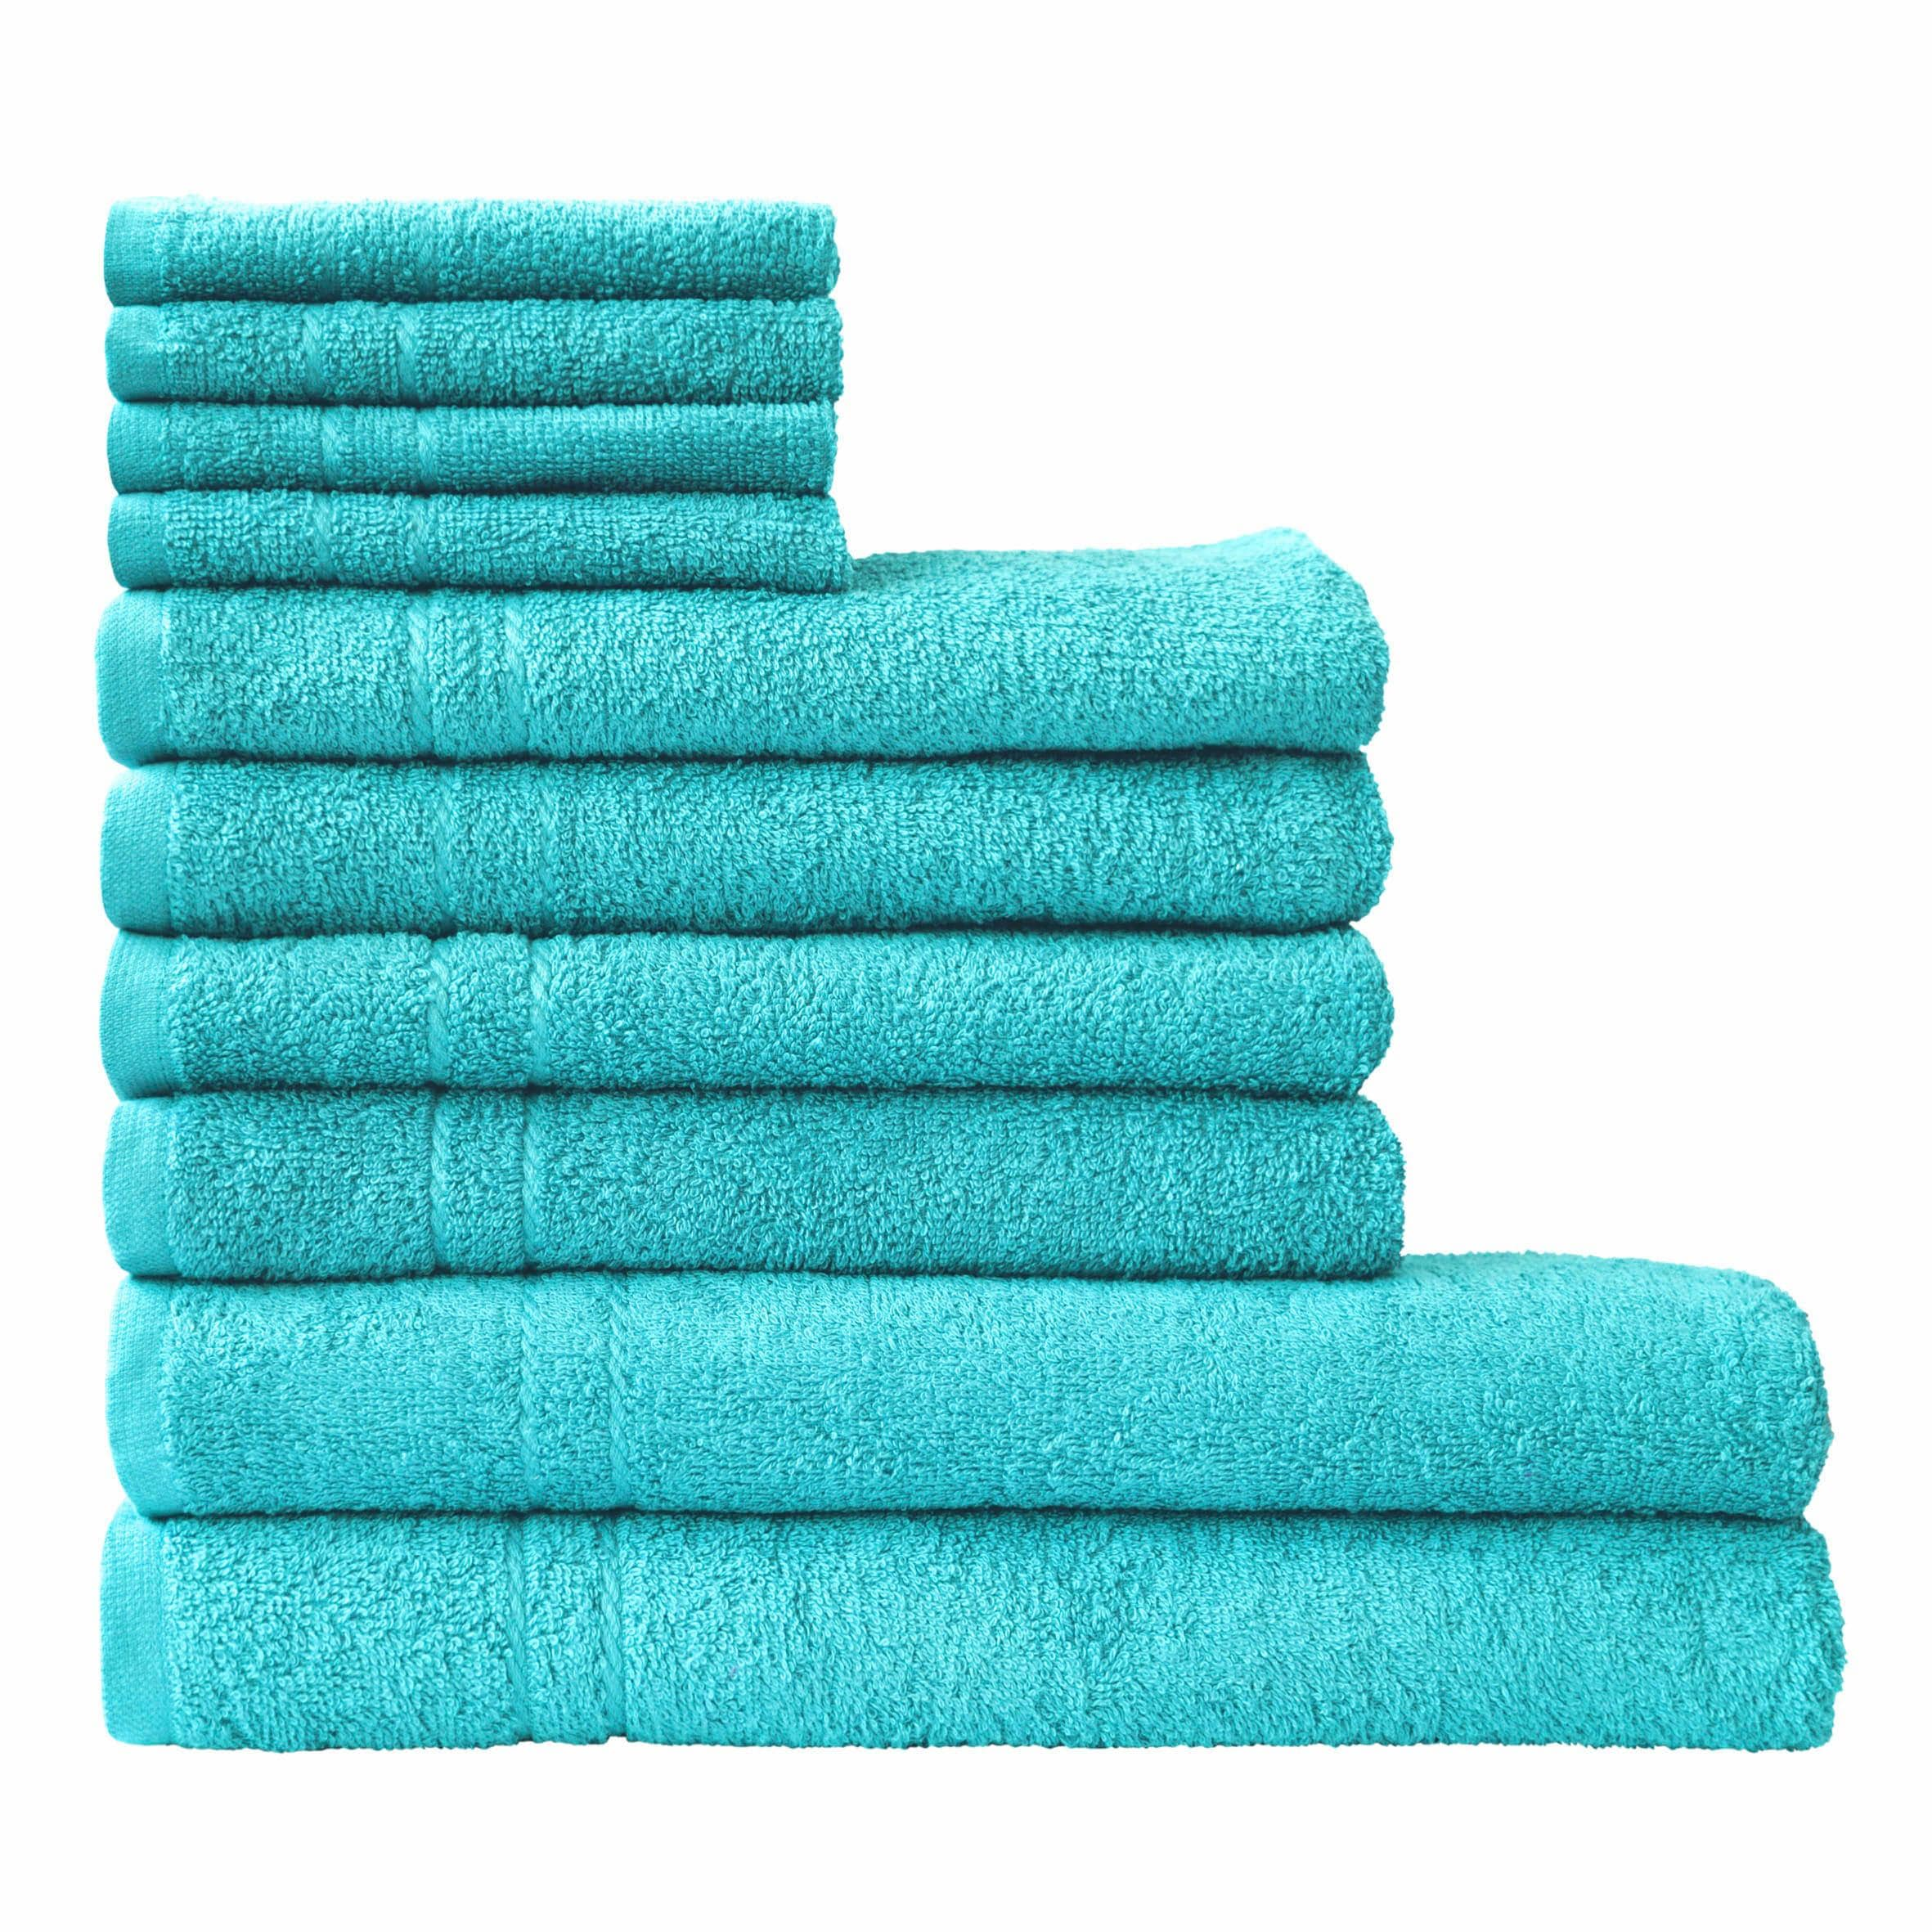 Dyckhoff Handtuch Set Kristall, mit feiner Bordüre blau Handtuch-Sets Handtücher Badetücher